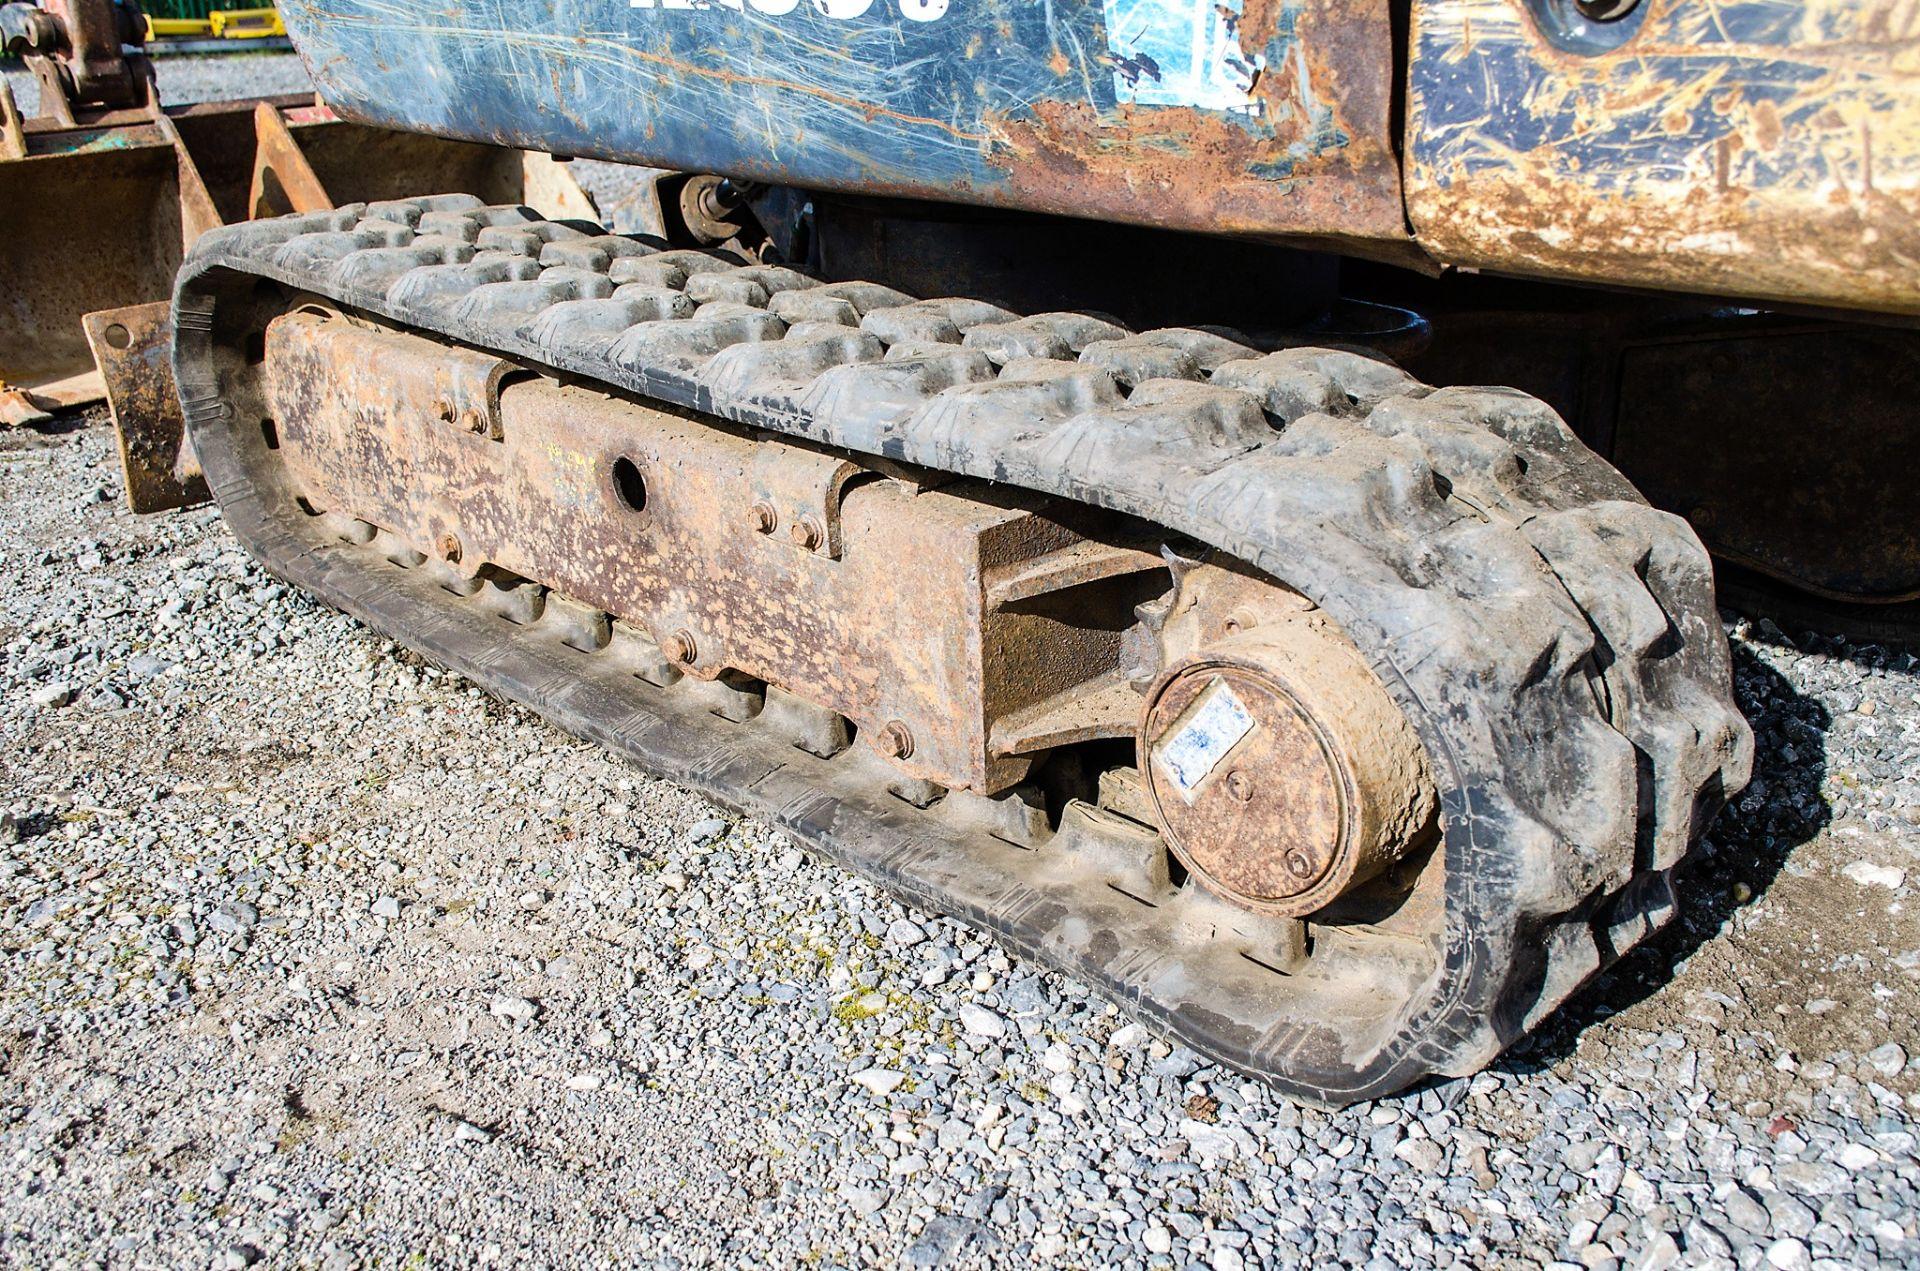 Kubota KX36-3 1.5 tonne rubber tracked mini excavator Year: 2007 S/N: Z077298 Recorded Hours: 4205 - Image 9 of 18